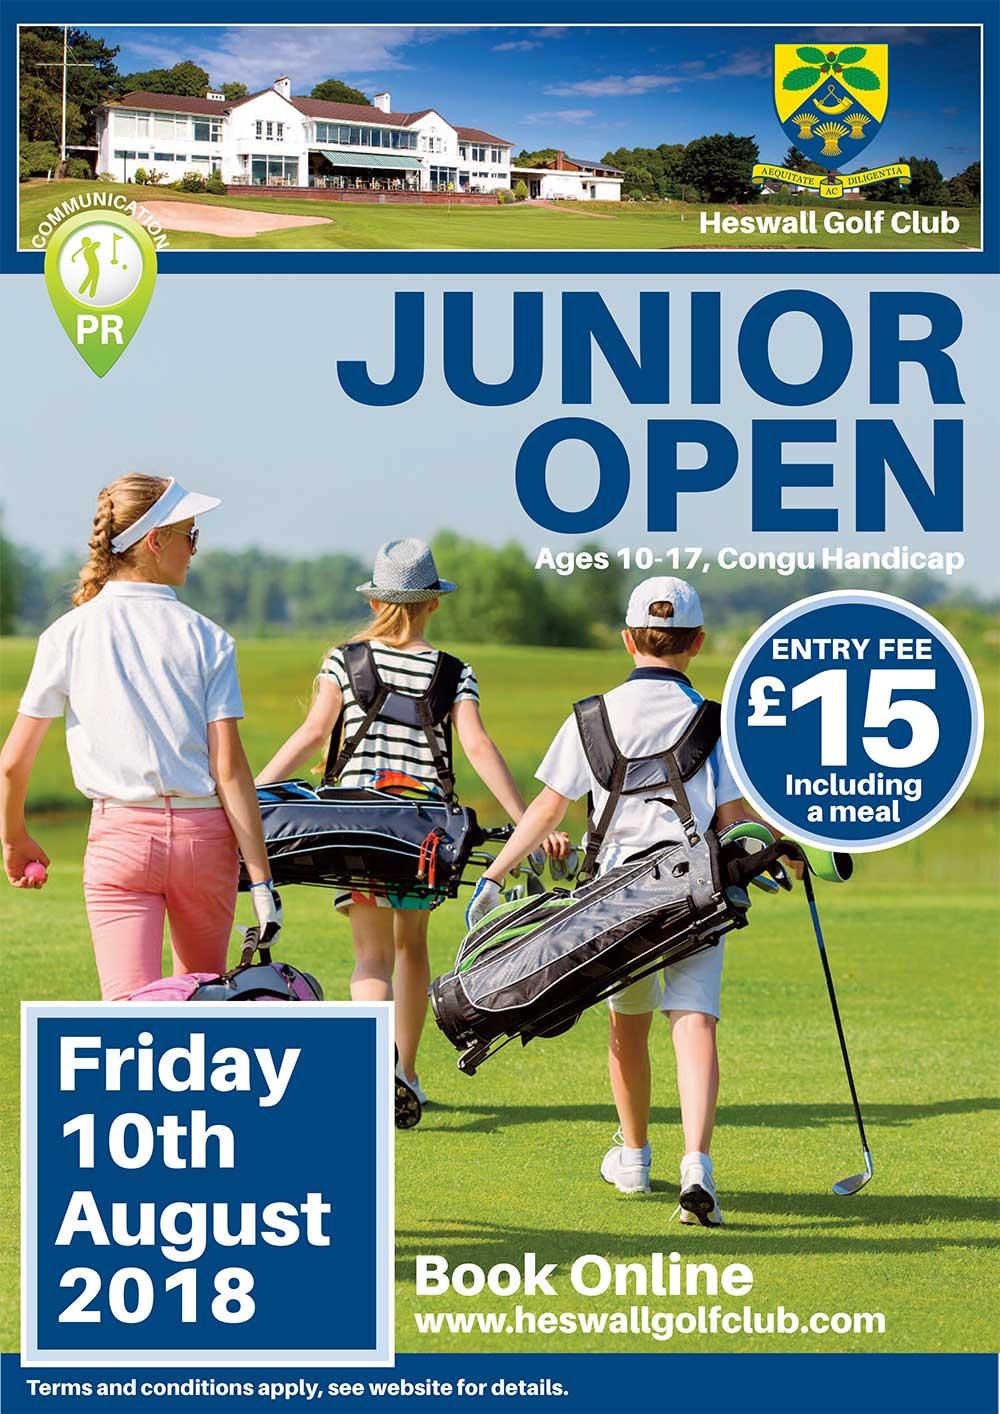 Junior Open 10th August 2018